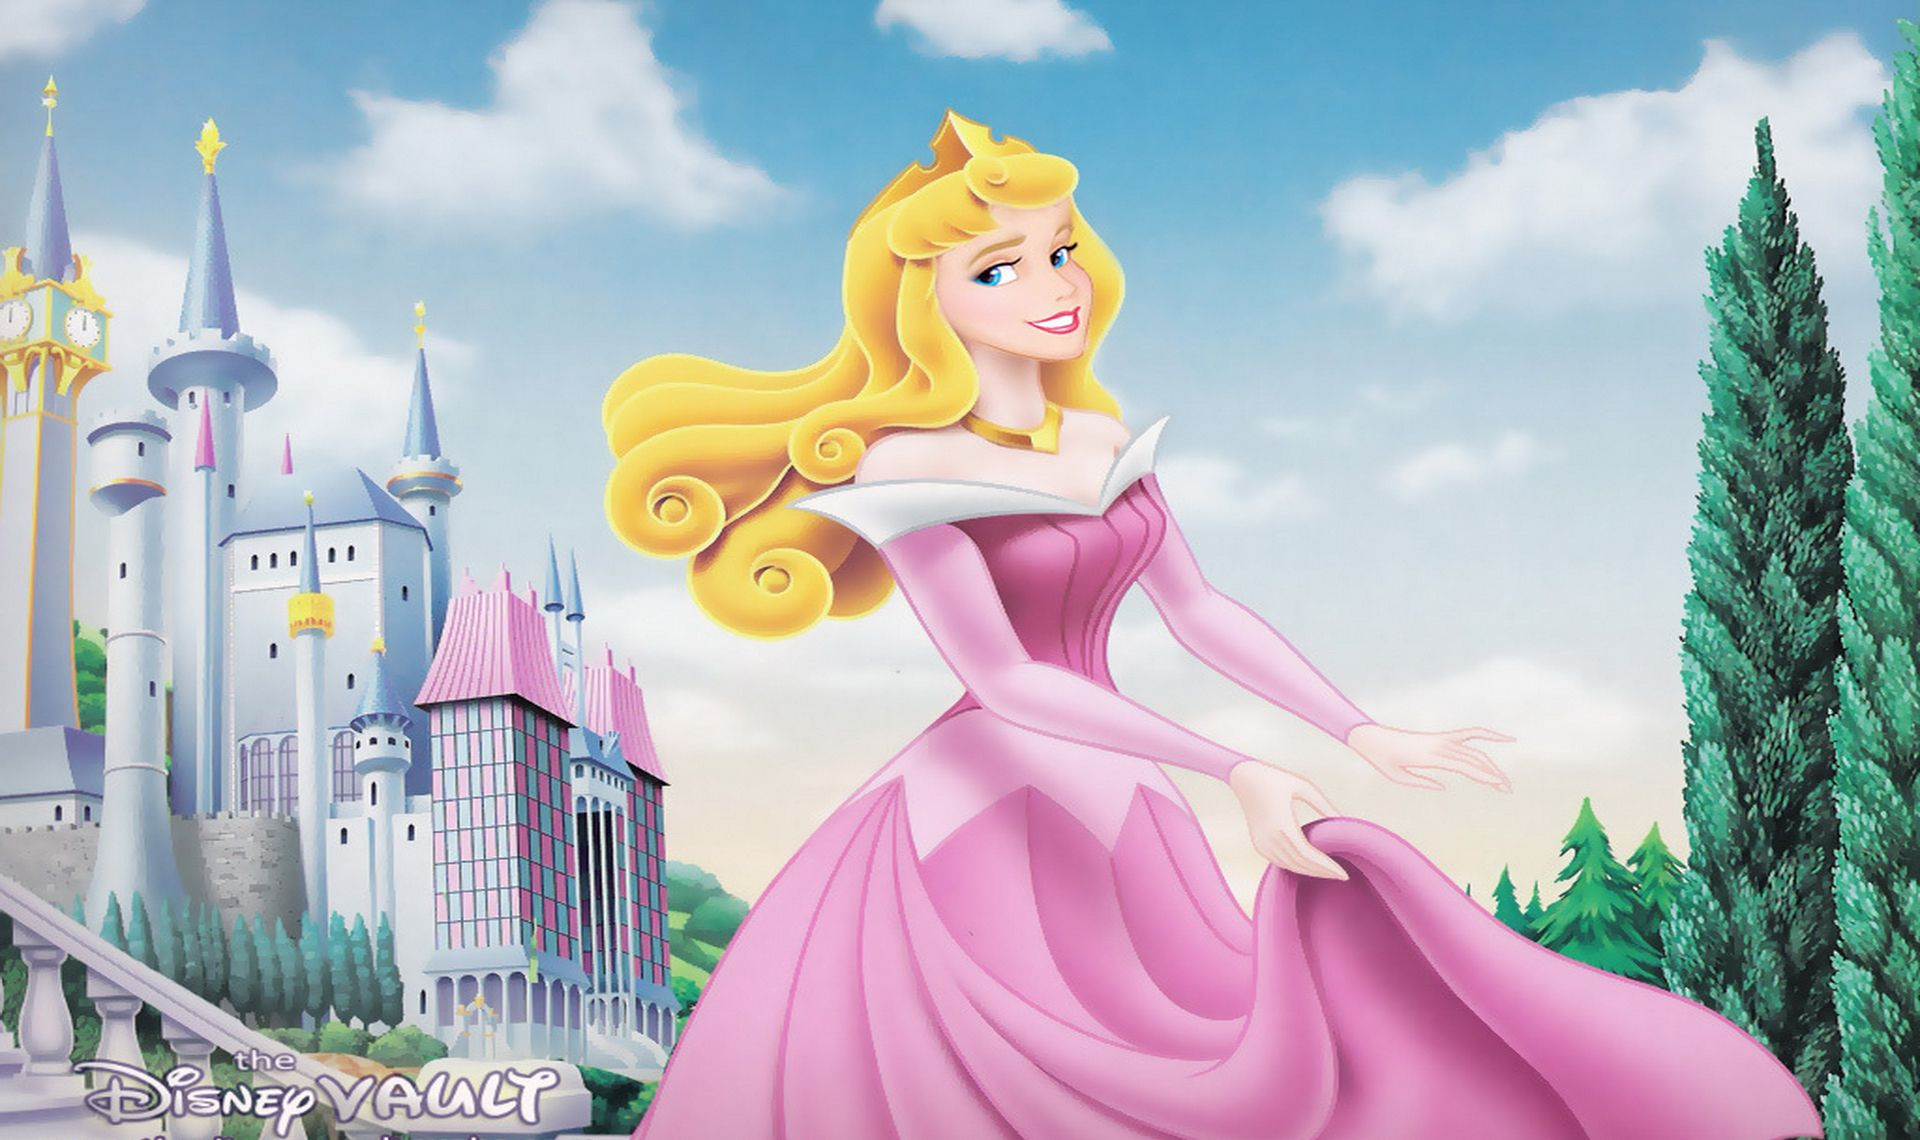 princess wallpapers 7 | cartoons wallpapers | pinterest | wallpaper